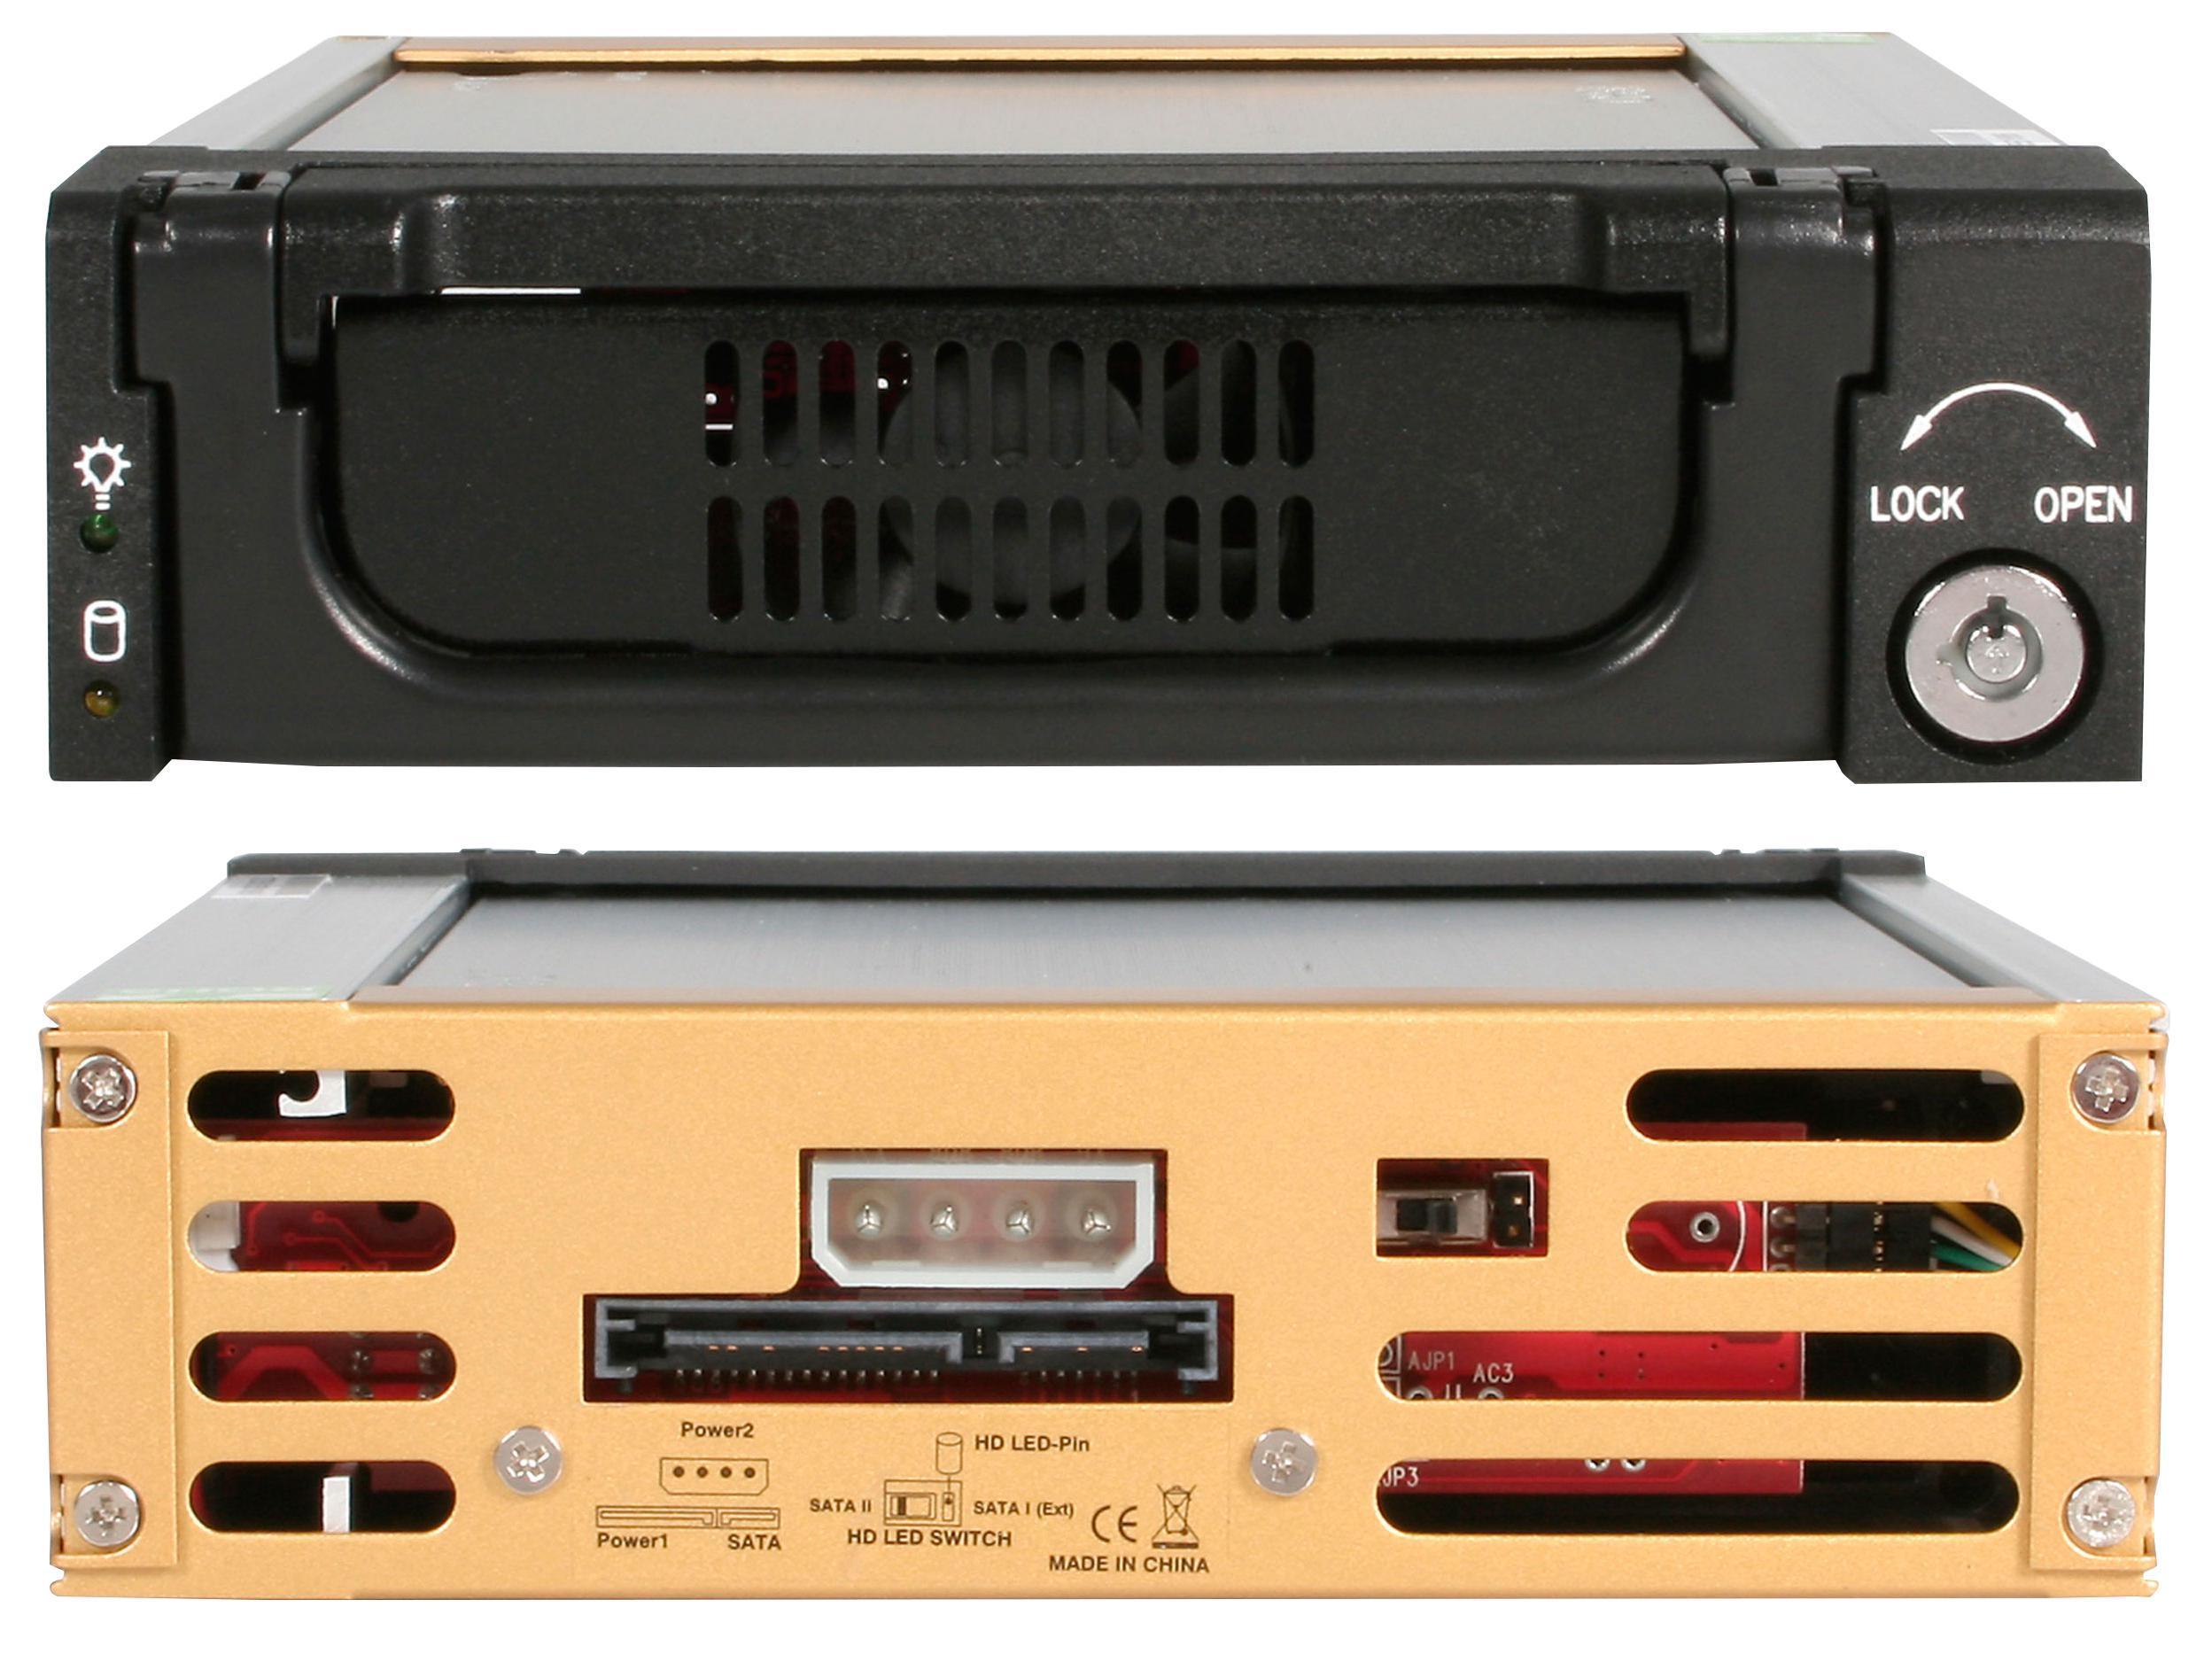 Startech drw150satbk 5 25 034 rugged sata hard drive - Mobel reck ...